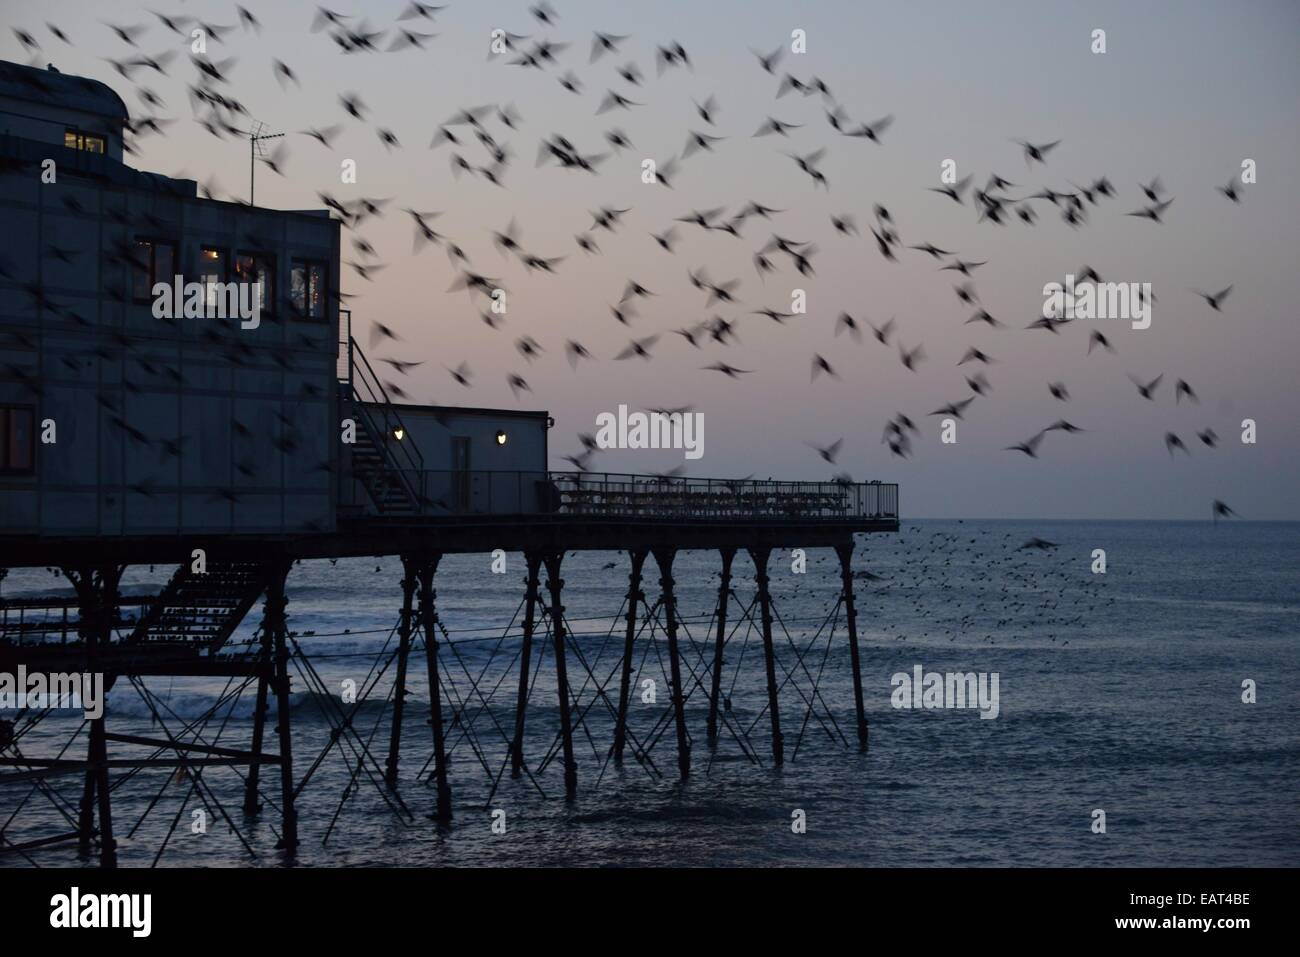 Aberystwyth Wales UK , 20 November 2014  Starlings roosting on Aberystwyth  pier at sundown. The dramatic murmuration Stock Photo